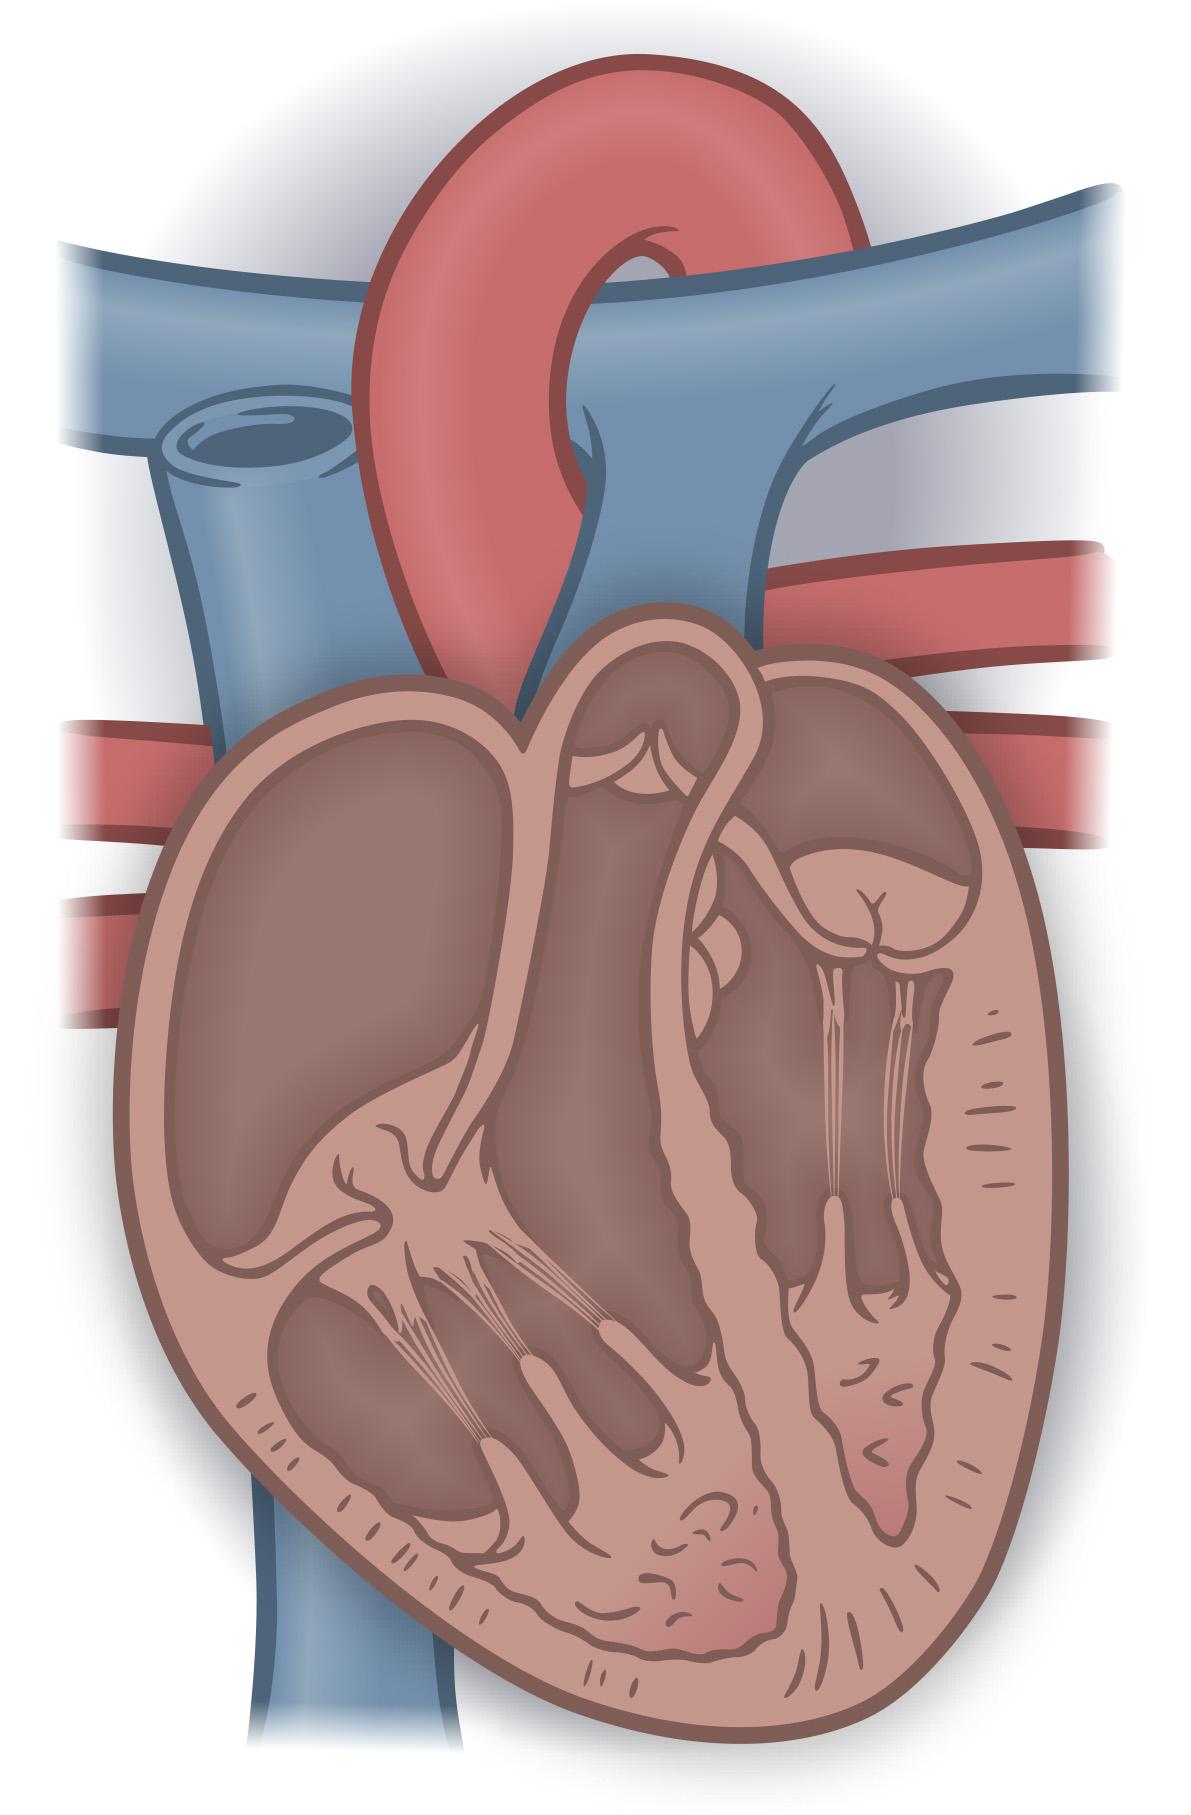 Human heart cross-section